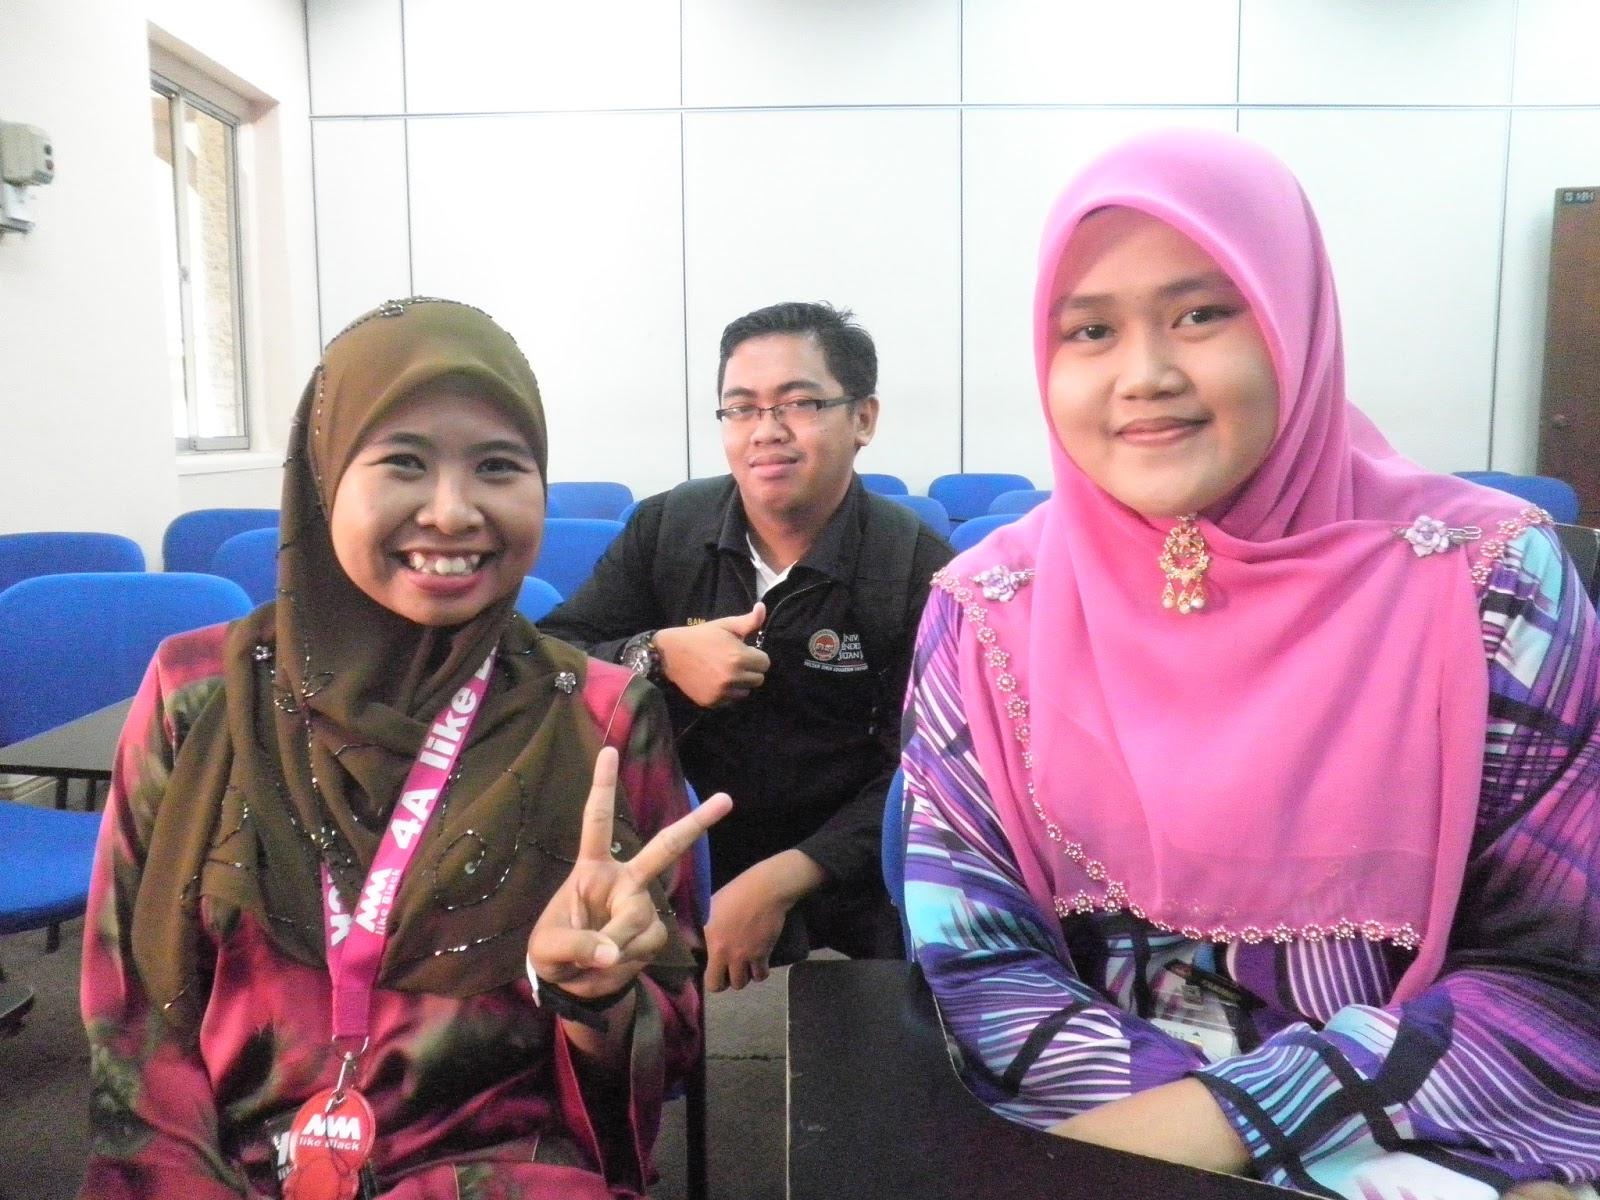 Resepi Rendang Negeri Sembilan Asli - edwinas-blogs